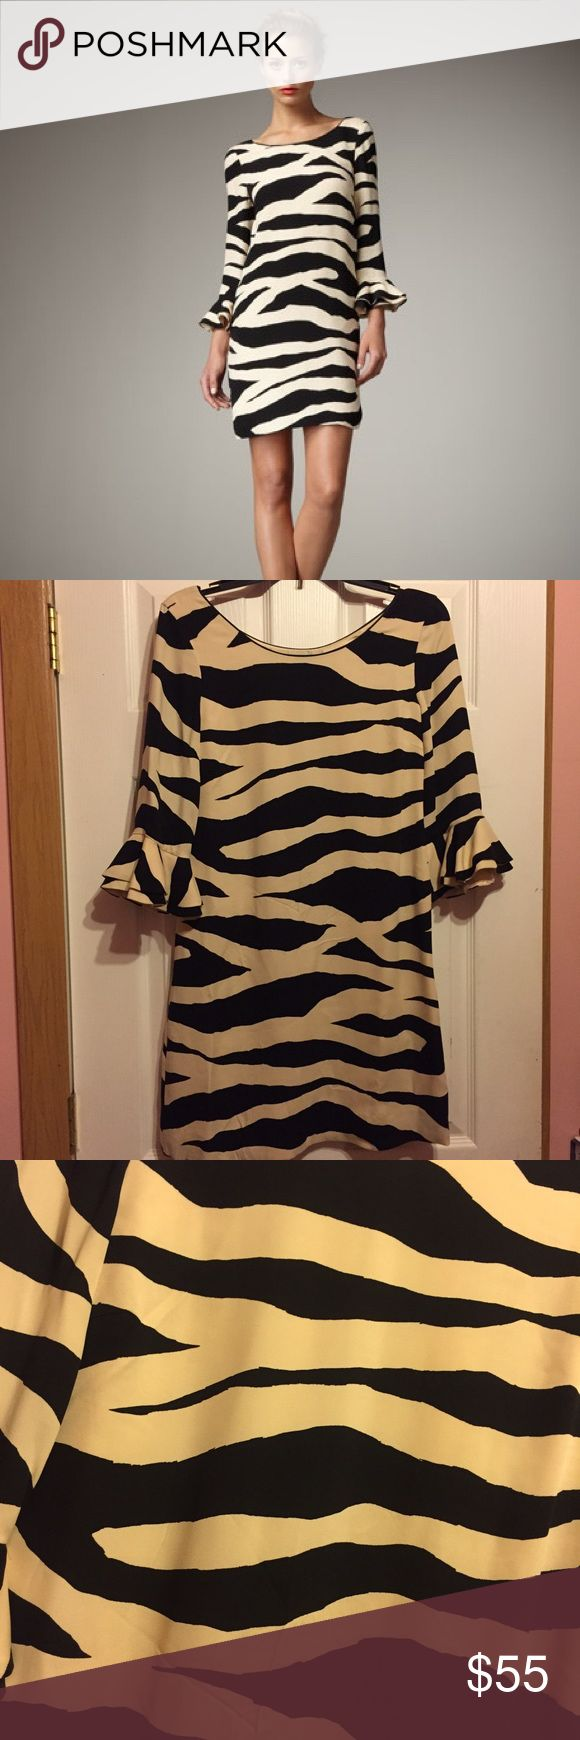 Kate Spade Andora Zebra Print Dress Kate Spade Andora Zebra print dress. Only worn once. Absolutely love this dress! But it no longer fits :/ Like new, no stains. Size 2. I'll take offers! kate spade Dresses Mini